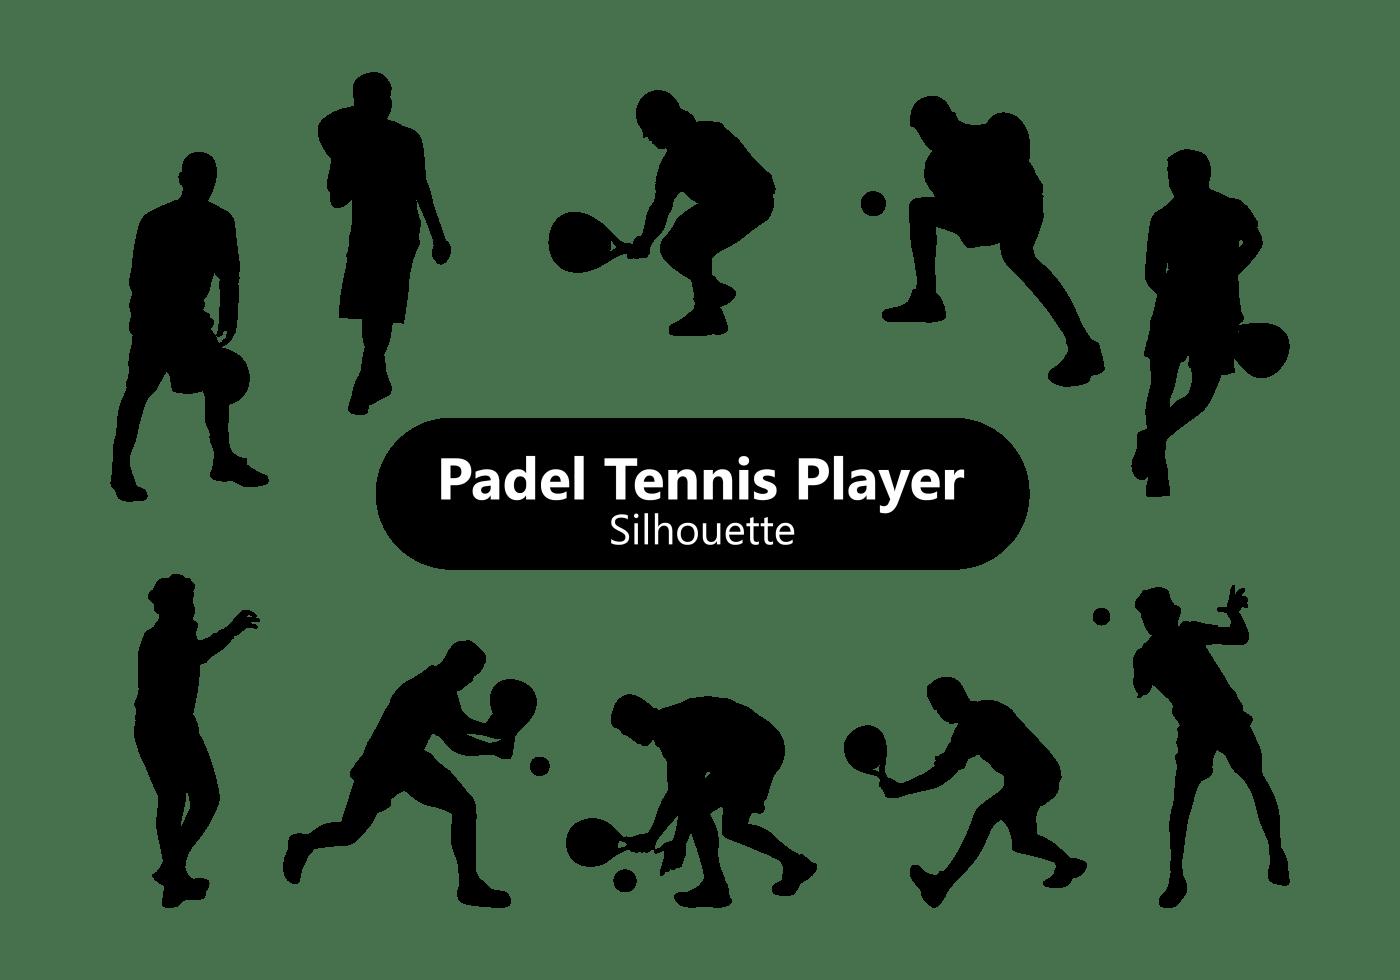 Padel Tennis Player Silhouette